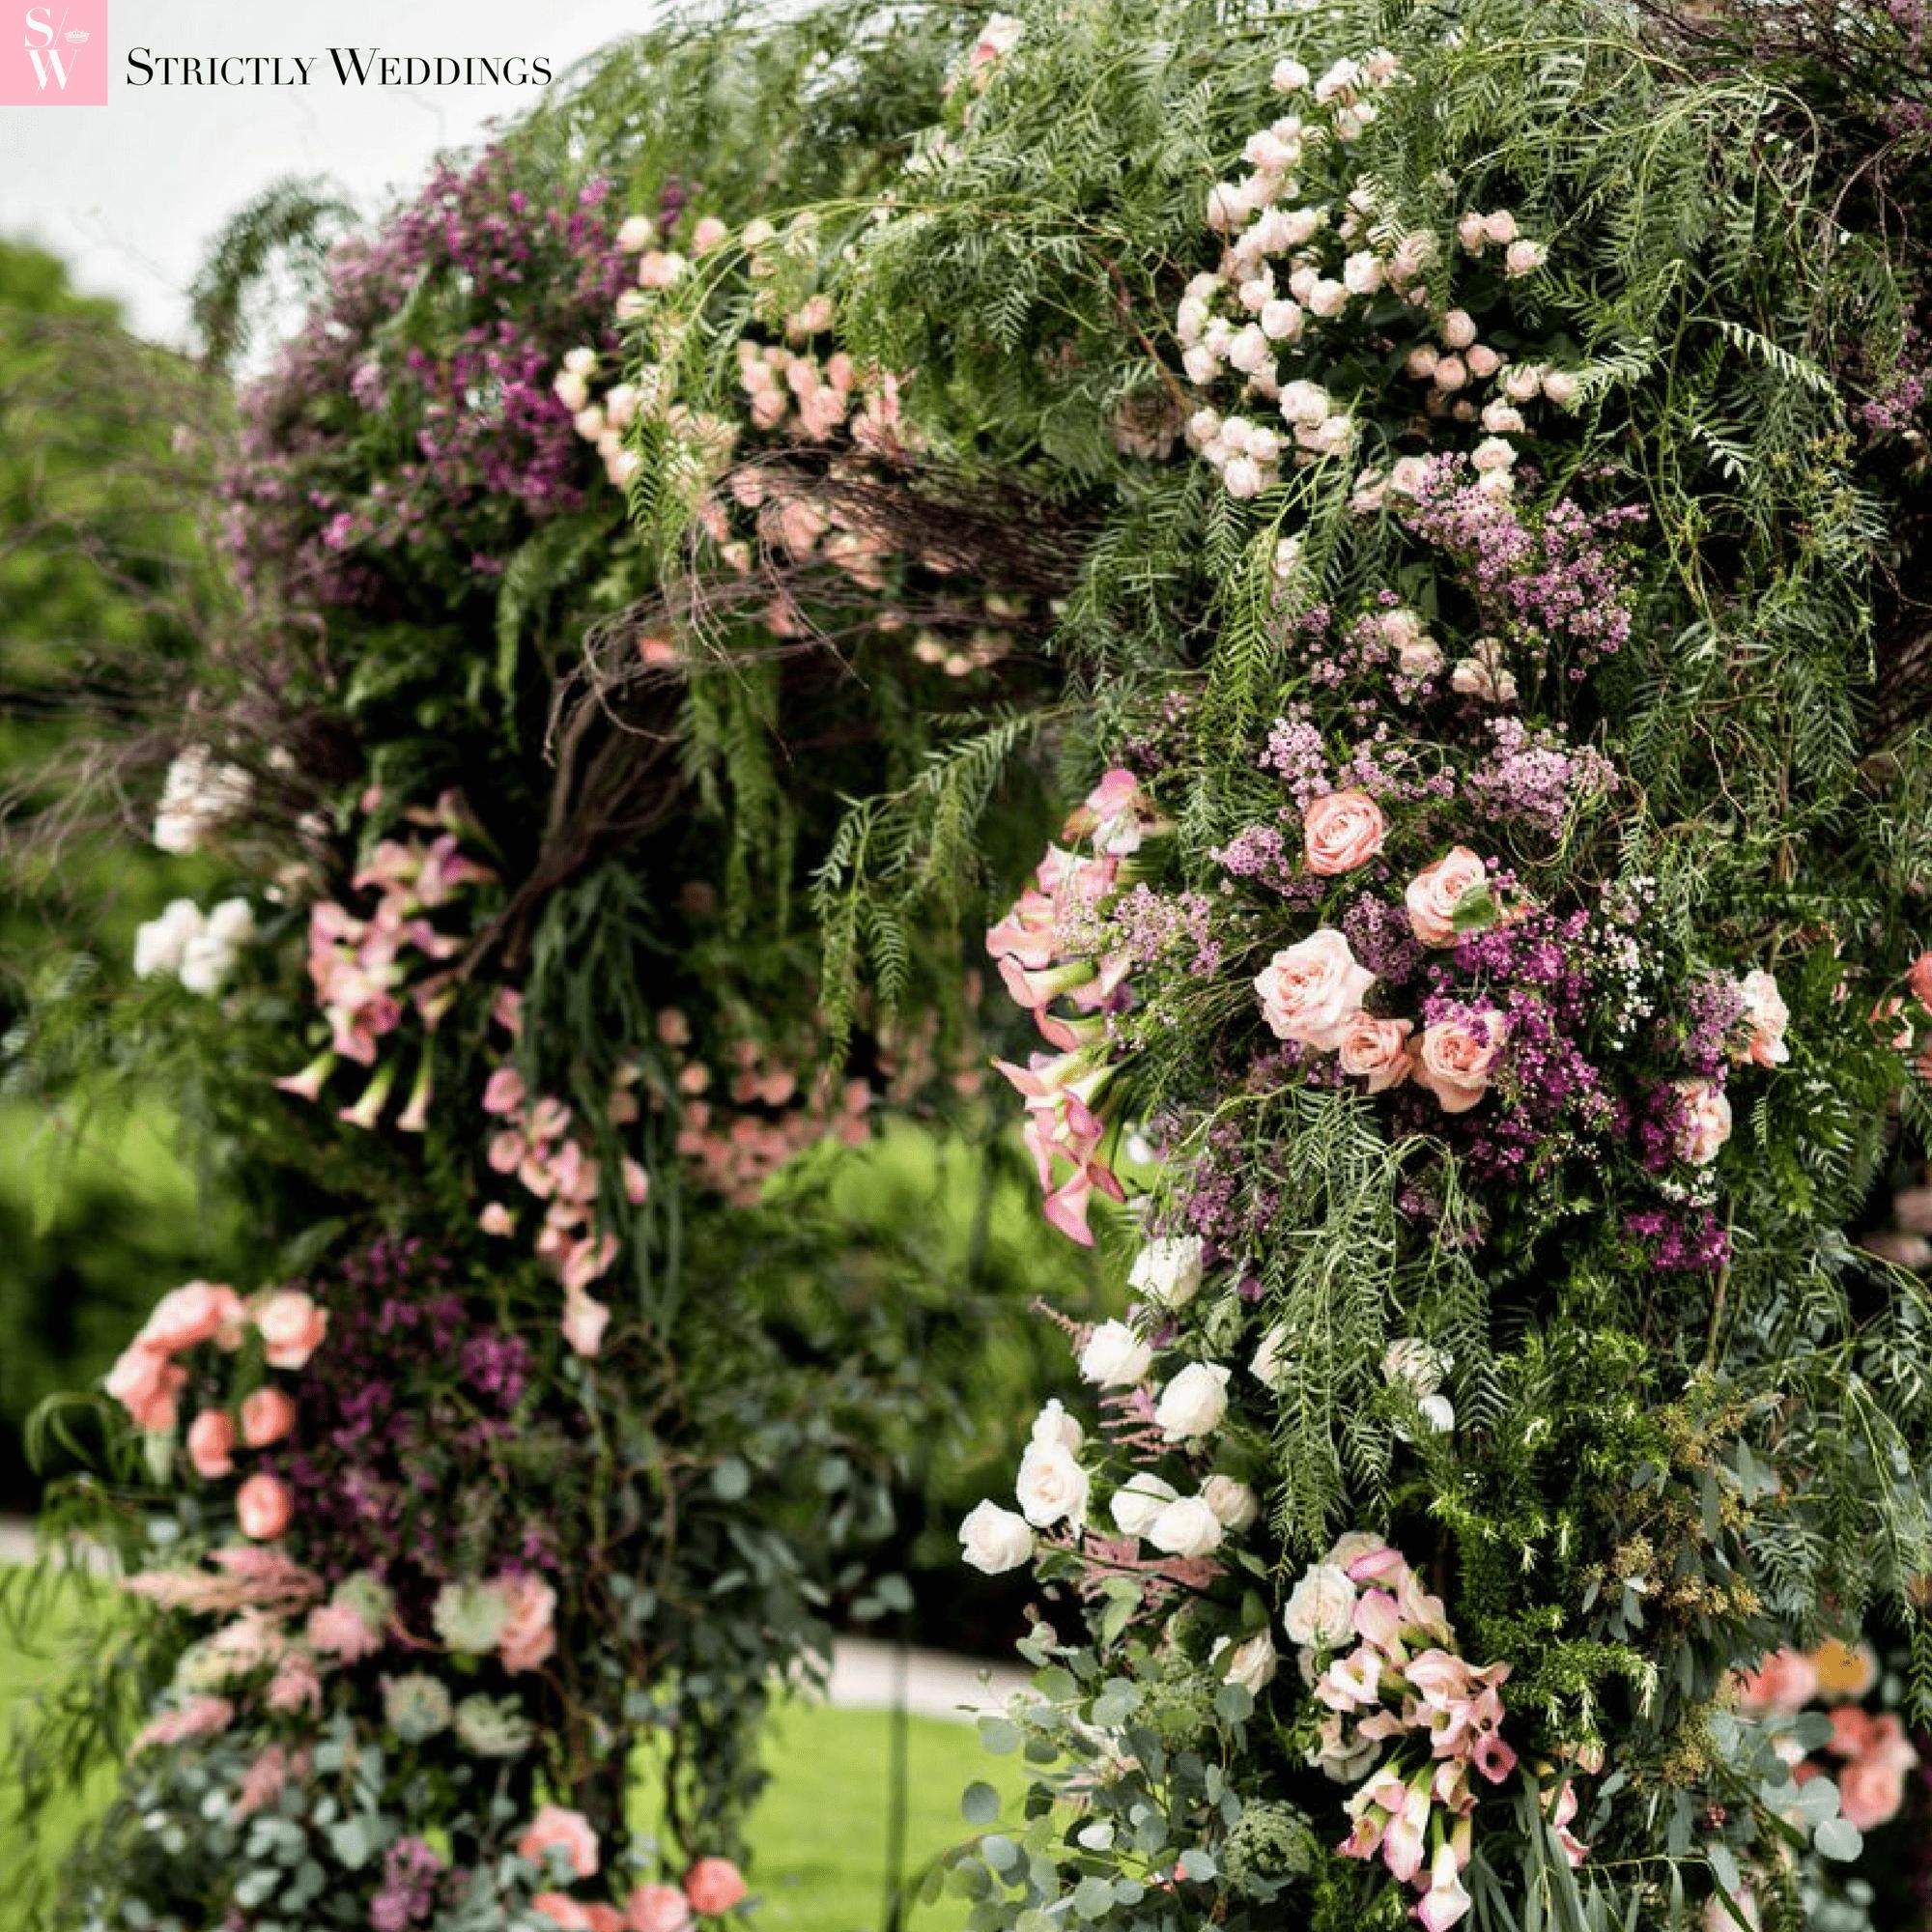 bel air, bel air wedding, bel air bay club, laurie bailey photo, marks garden, strictly weddings, los angeles wedding, florist, wedding flowers